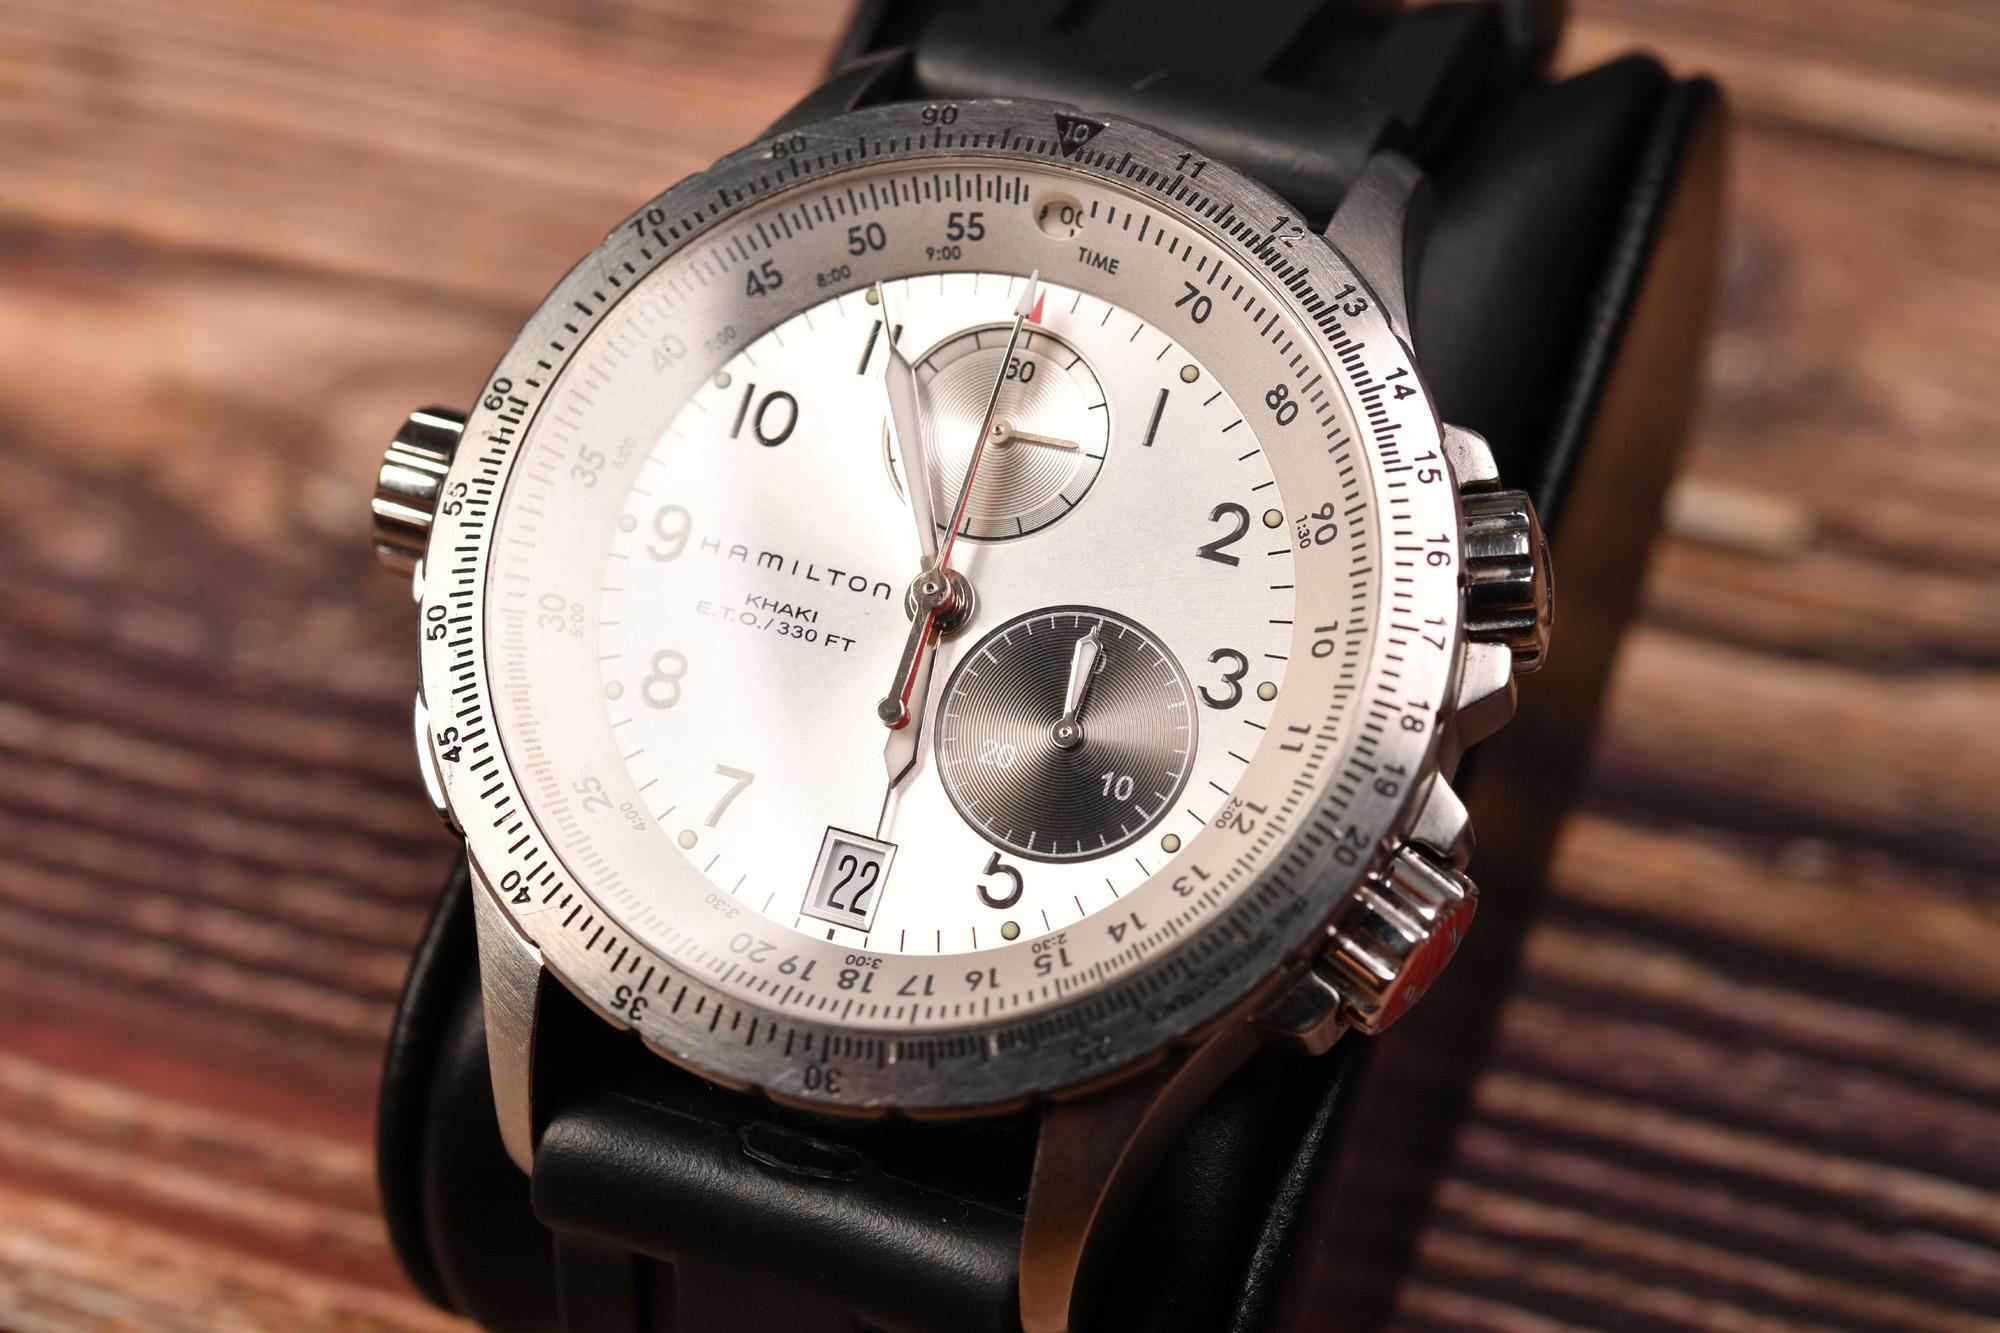 HAMILTON KHAKI E.T.O  H776220(ハミルトン カーキ ETO)腕時計購入しました。